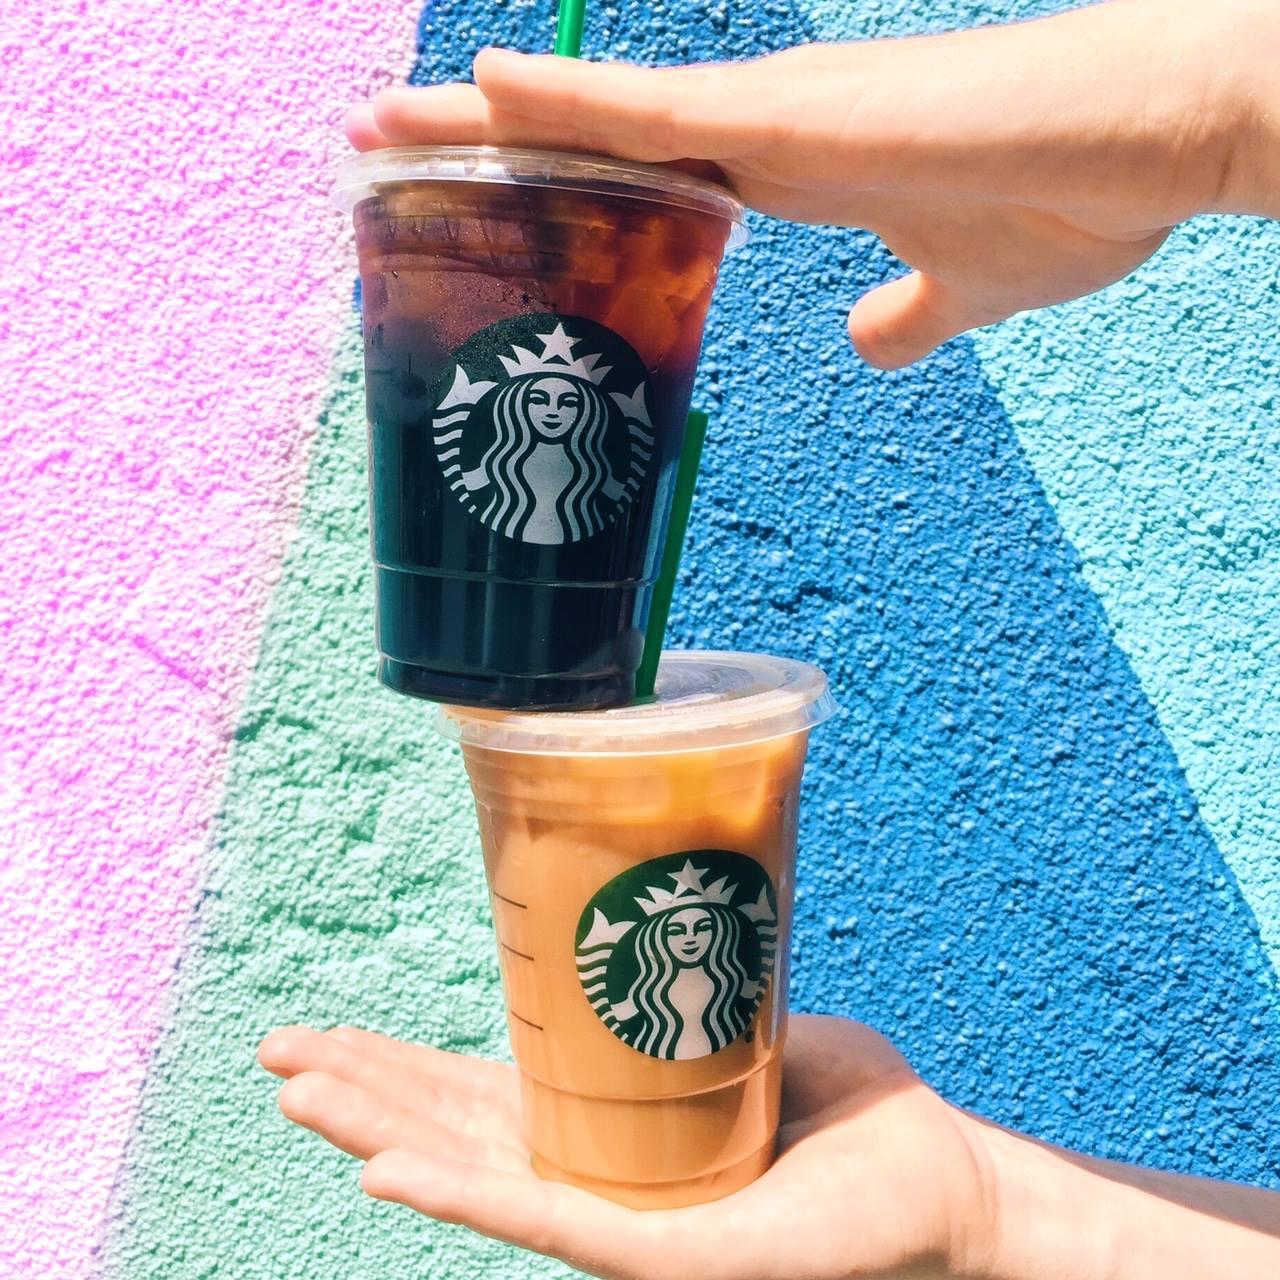 Any Starbucks Grande Drink $2.50